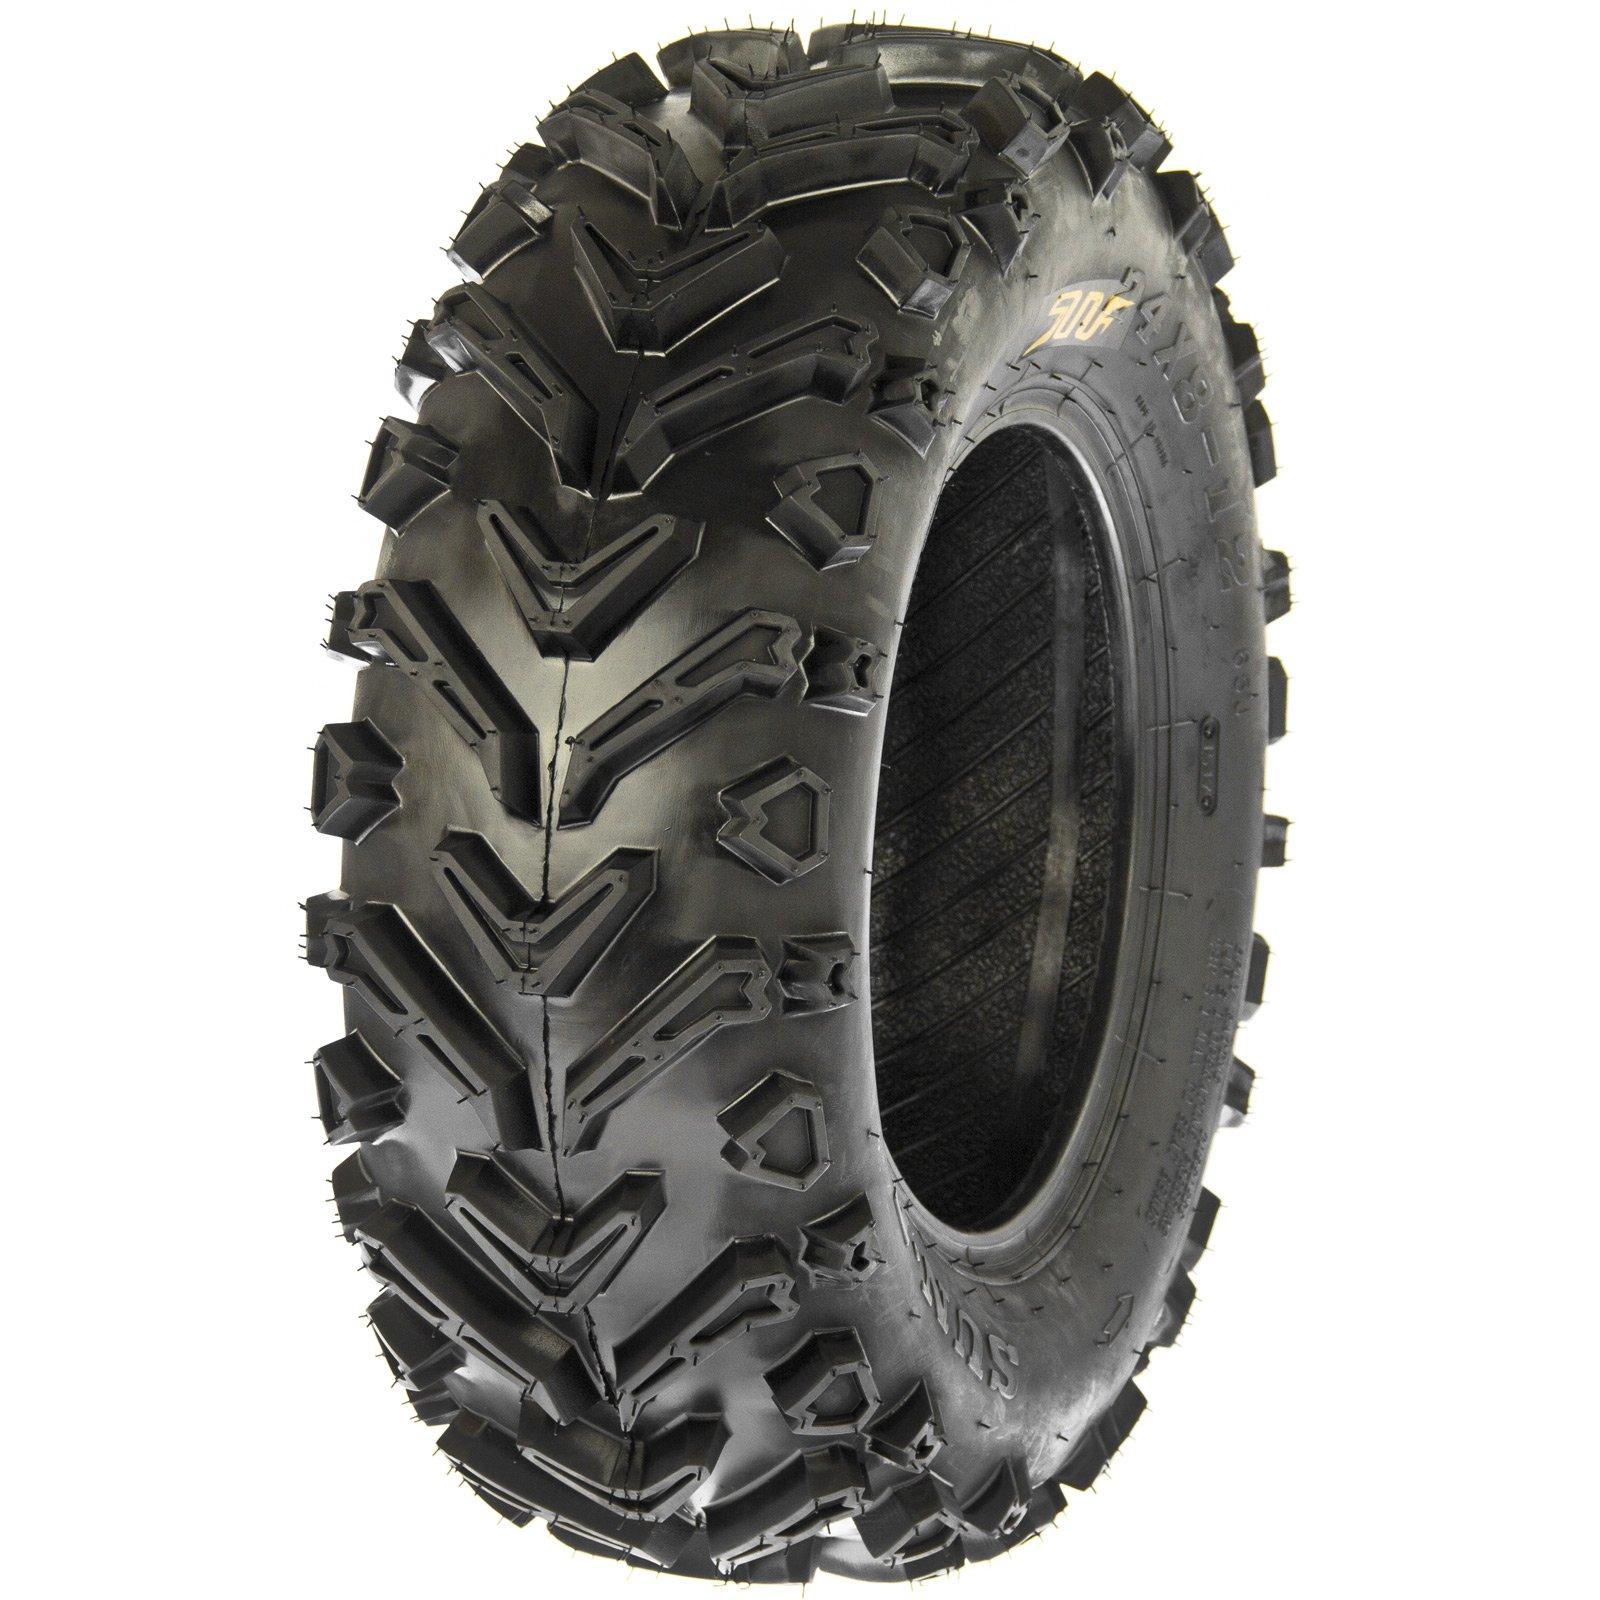 SunF All Trail & Mud ATV UTV Tires 24x8-12 24x10-11 6 PR A041 (Complete Full Set of 4) by SunF (Image #3)